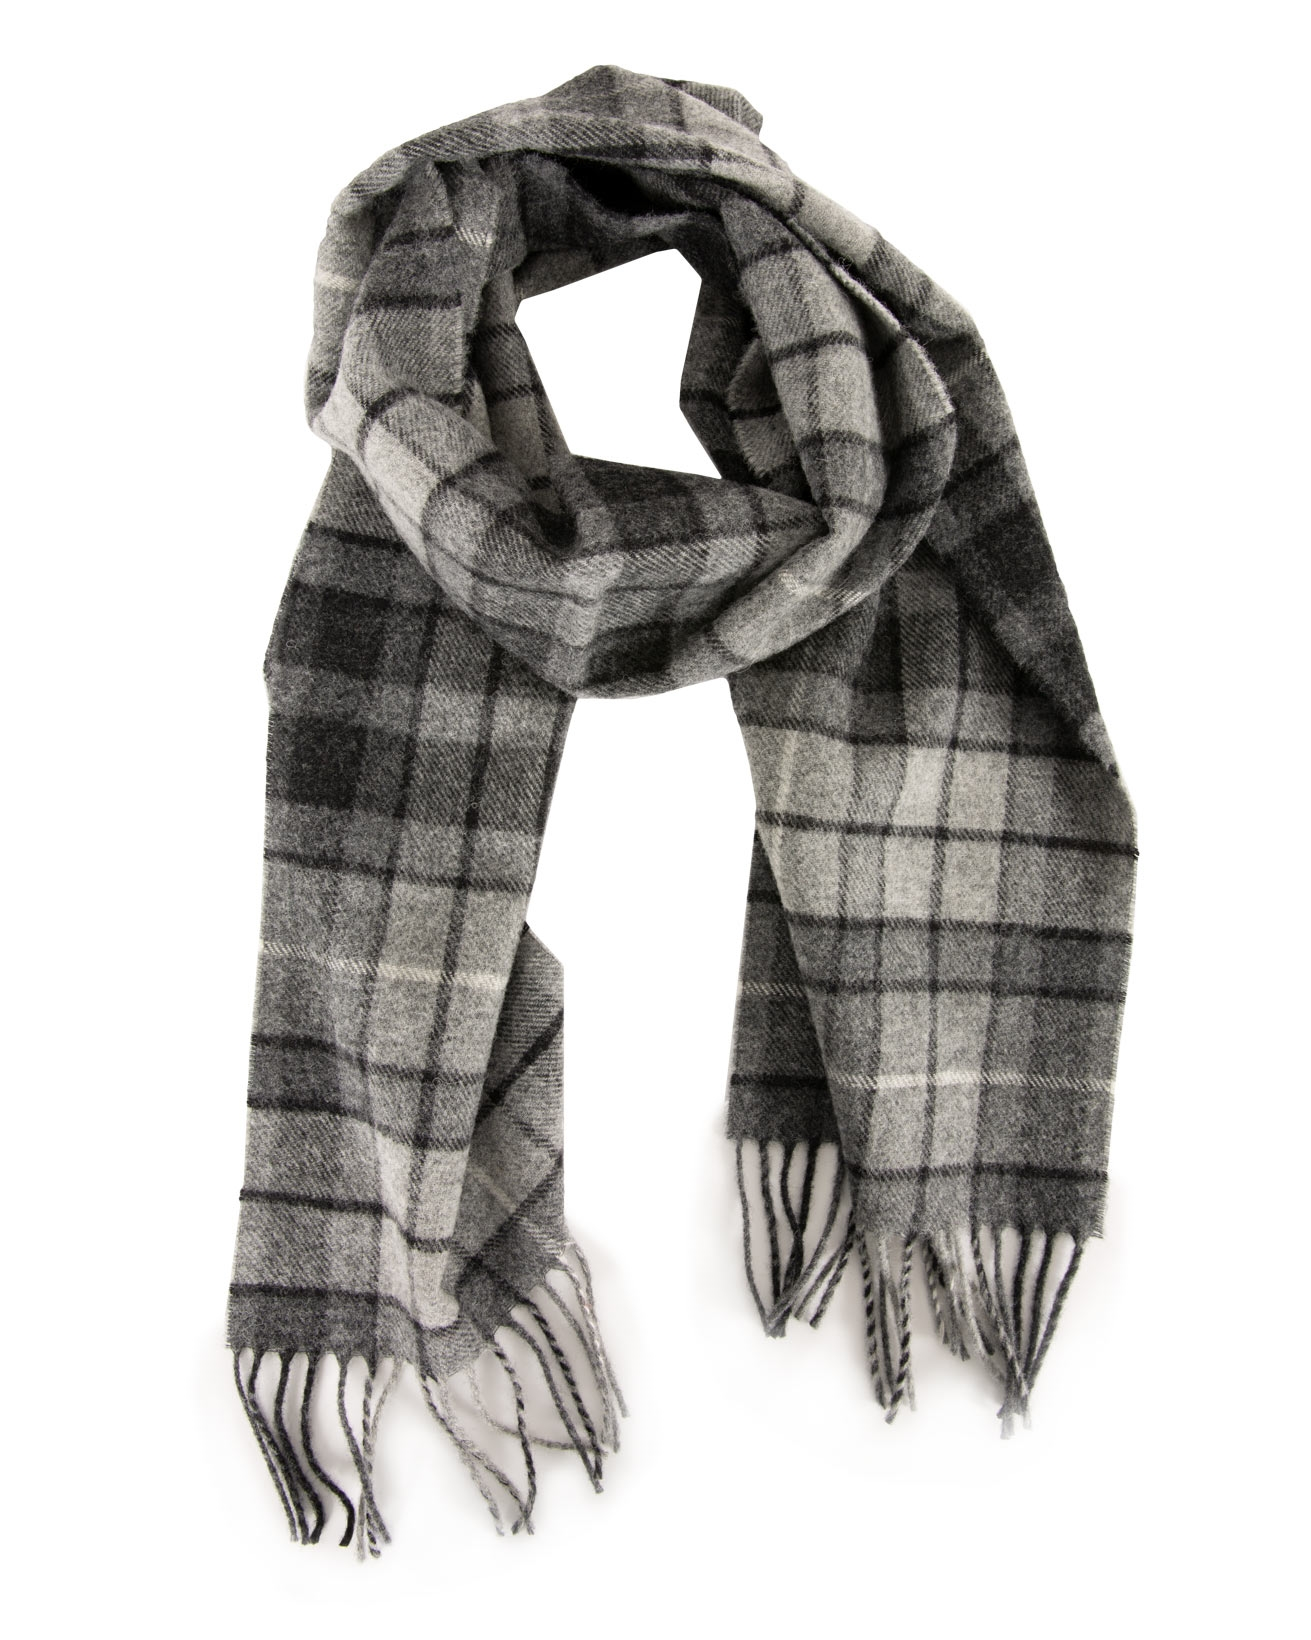 5864- lambswool tartah scarf- grey buchanan.jpg